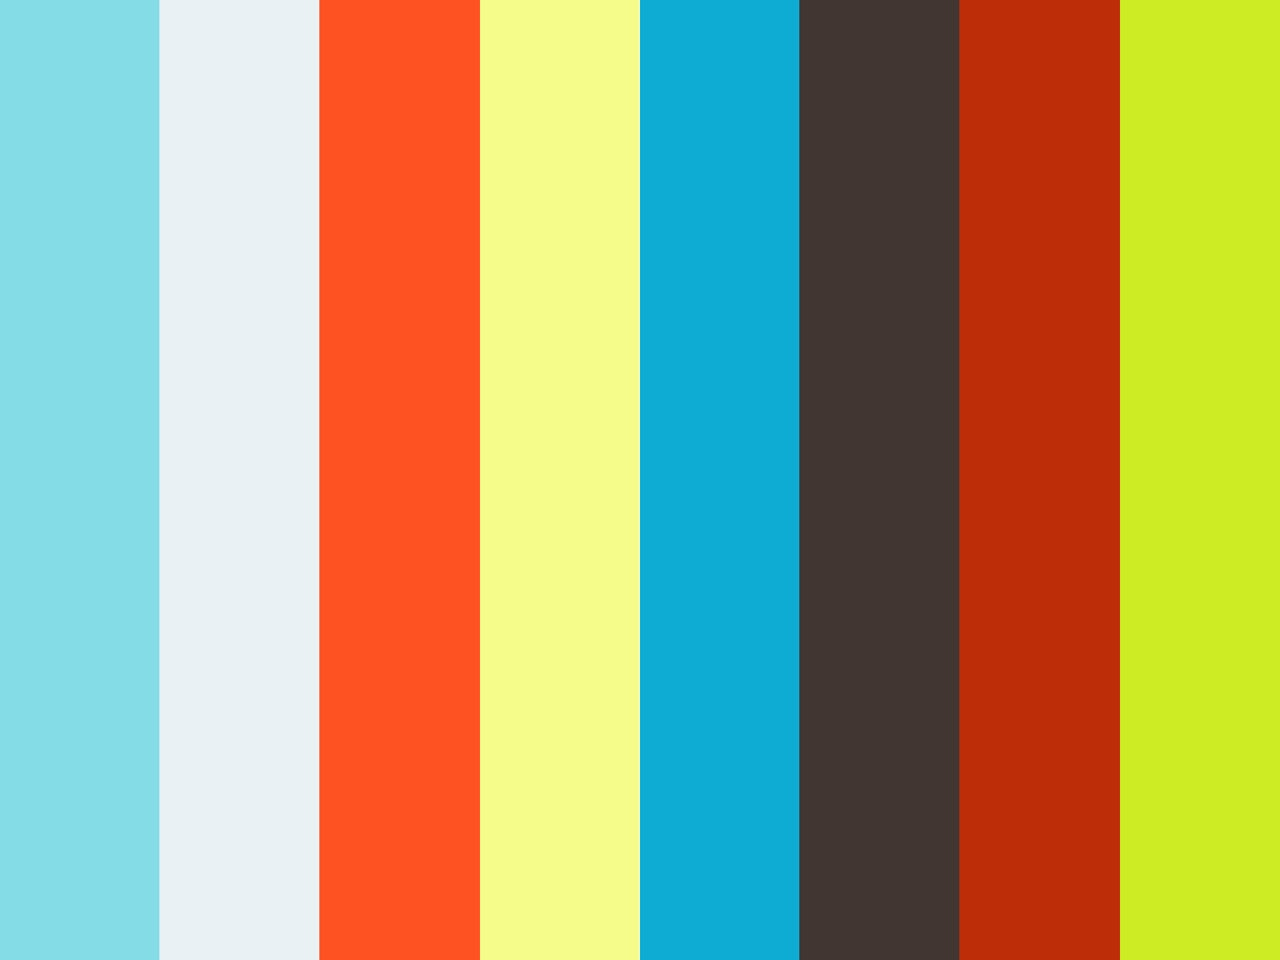 ECC // AMAZON WEB SERVICES V.2